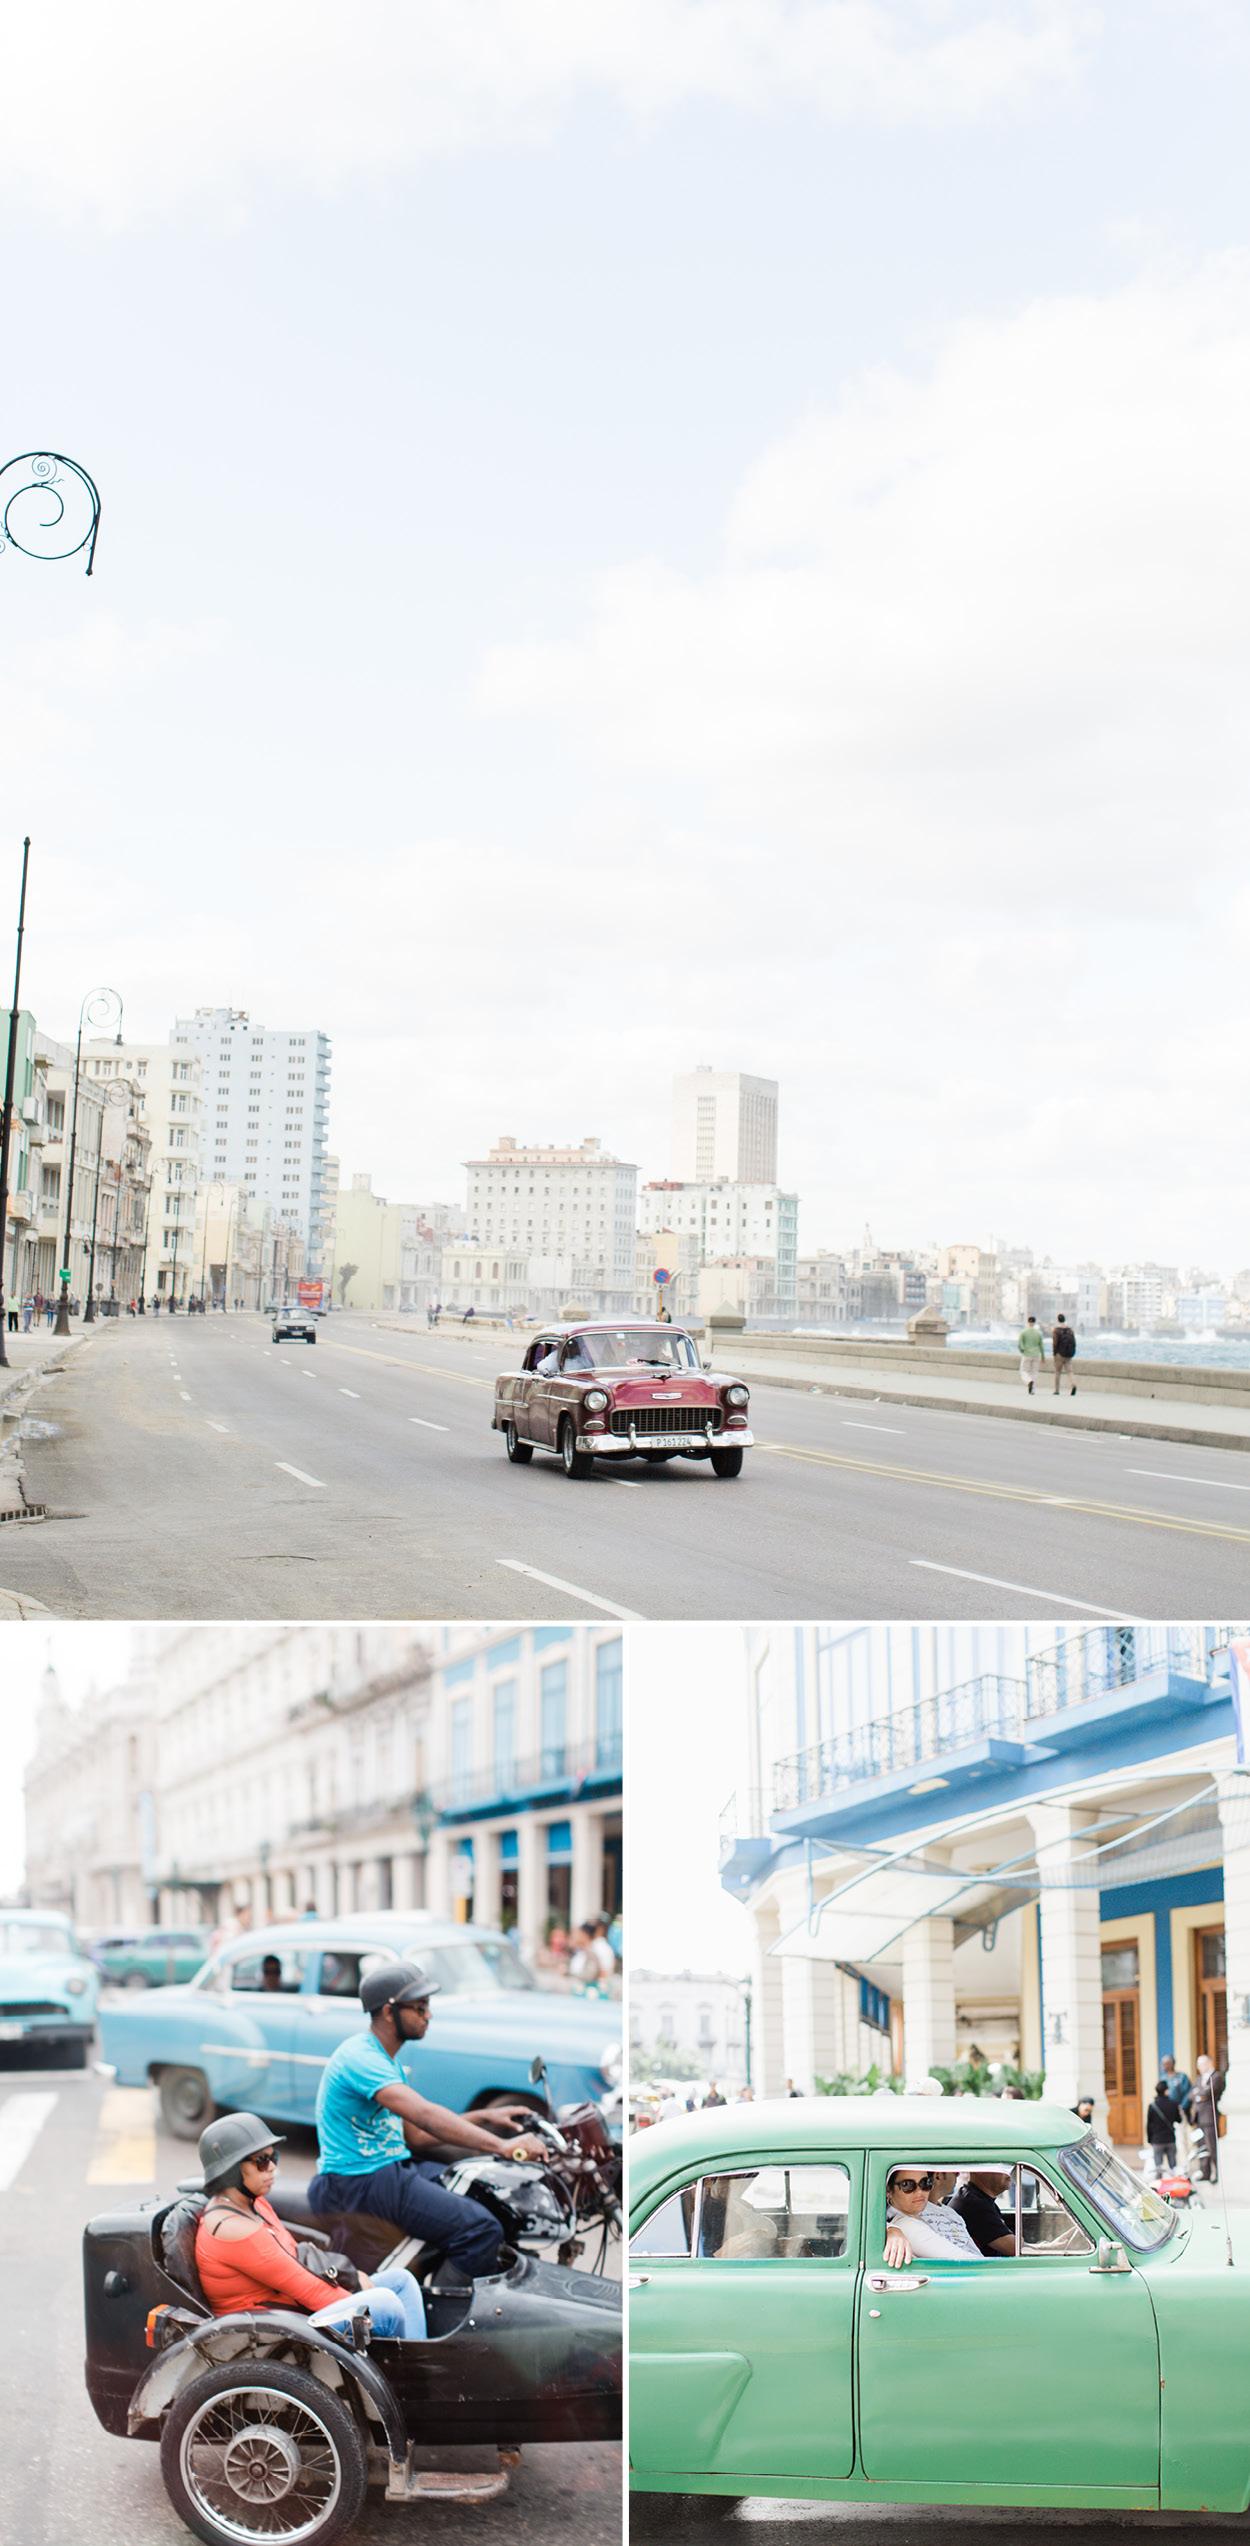 MatthewRee_Cuba_1_001.jpg